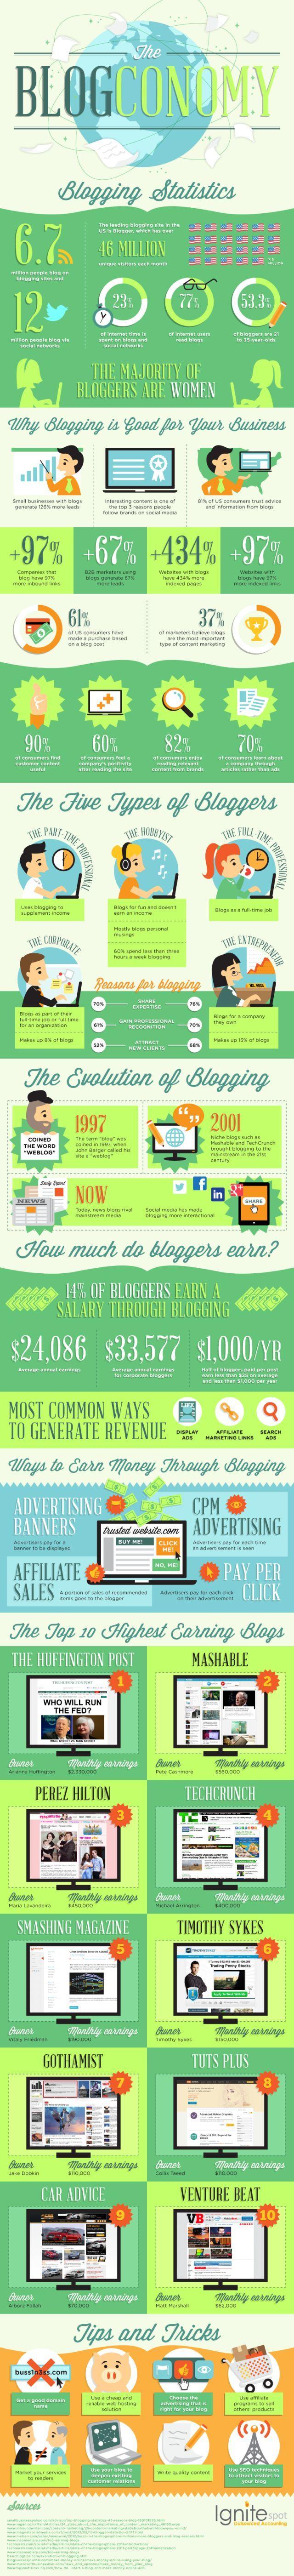 Highest Earning Blog Infographic (scheduled via http://www.tailwindapp.com?utm_source=pinterest&utm_medium=twpin&utm_content=post775117&utm_campaign=scheduler_attribution)